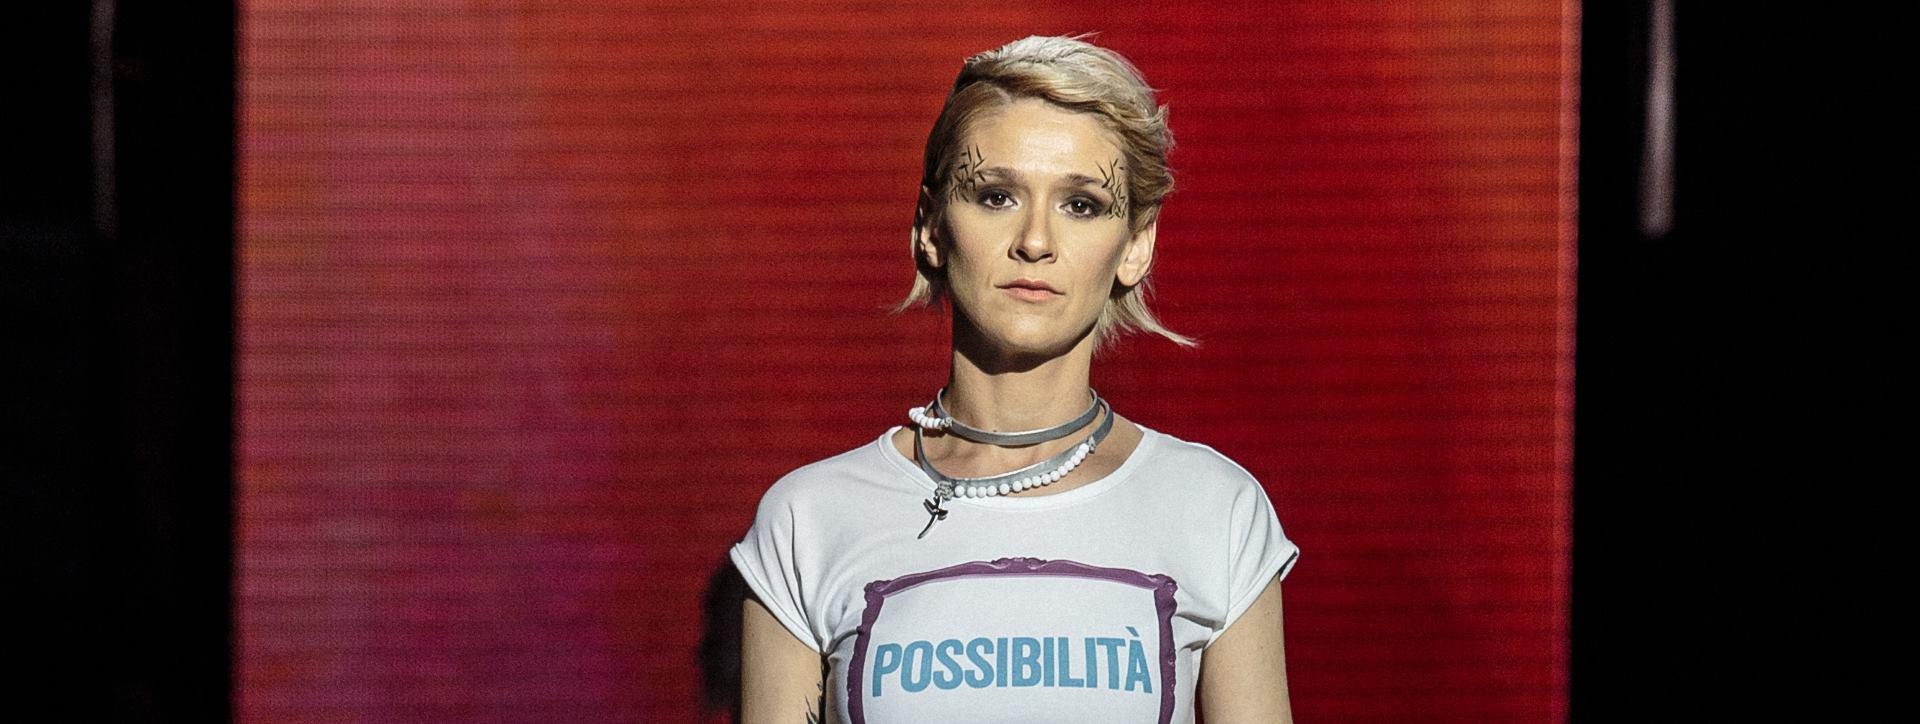 FOTO: Hrvatski brand Hope prepoznatljiv po porukama vedrine i nade